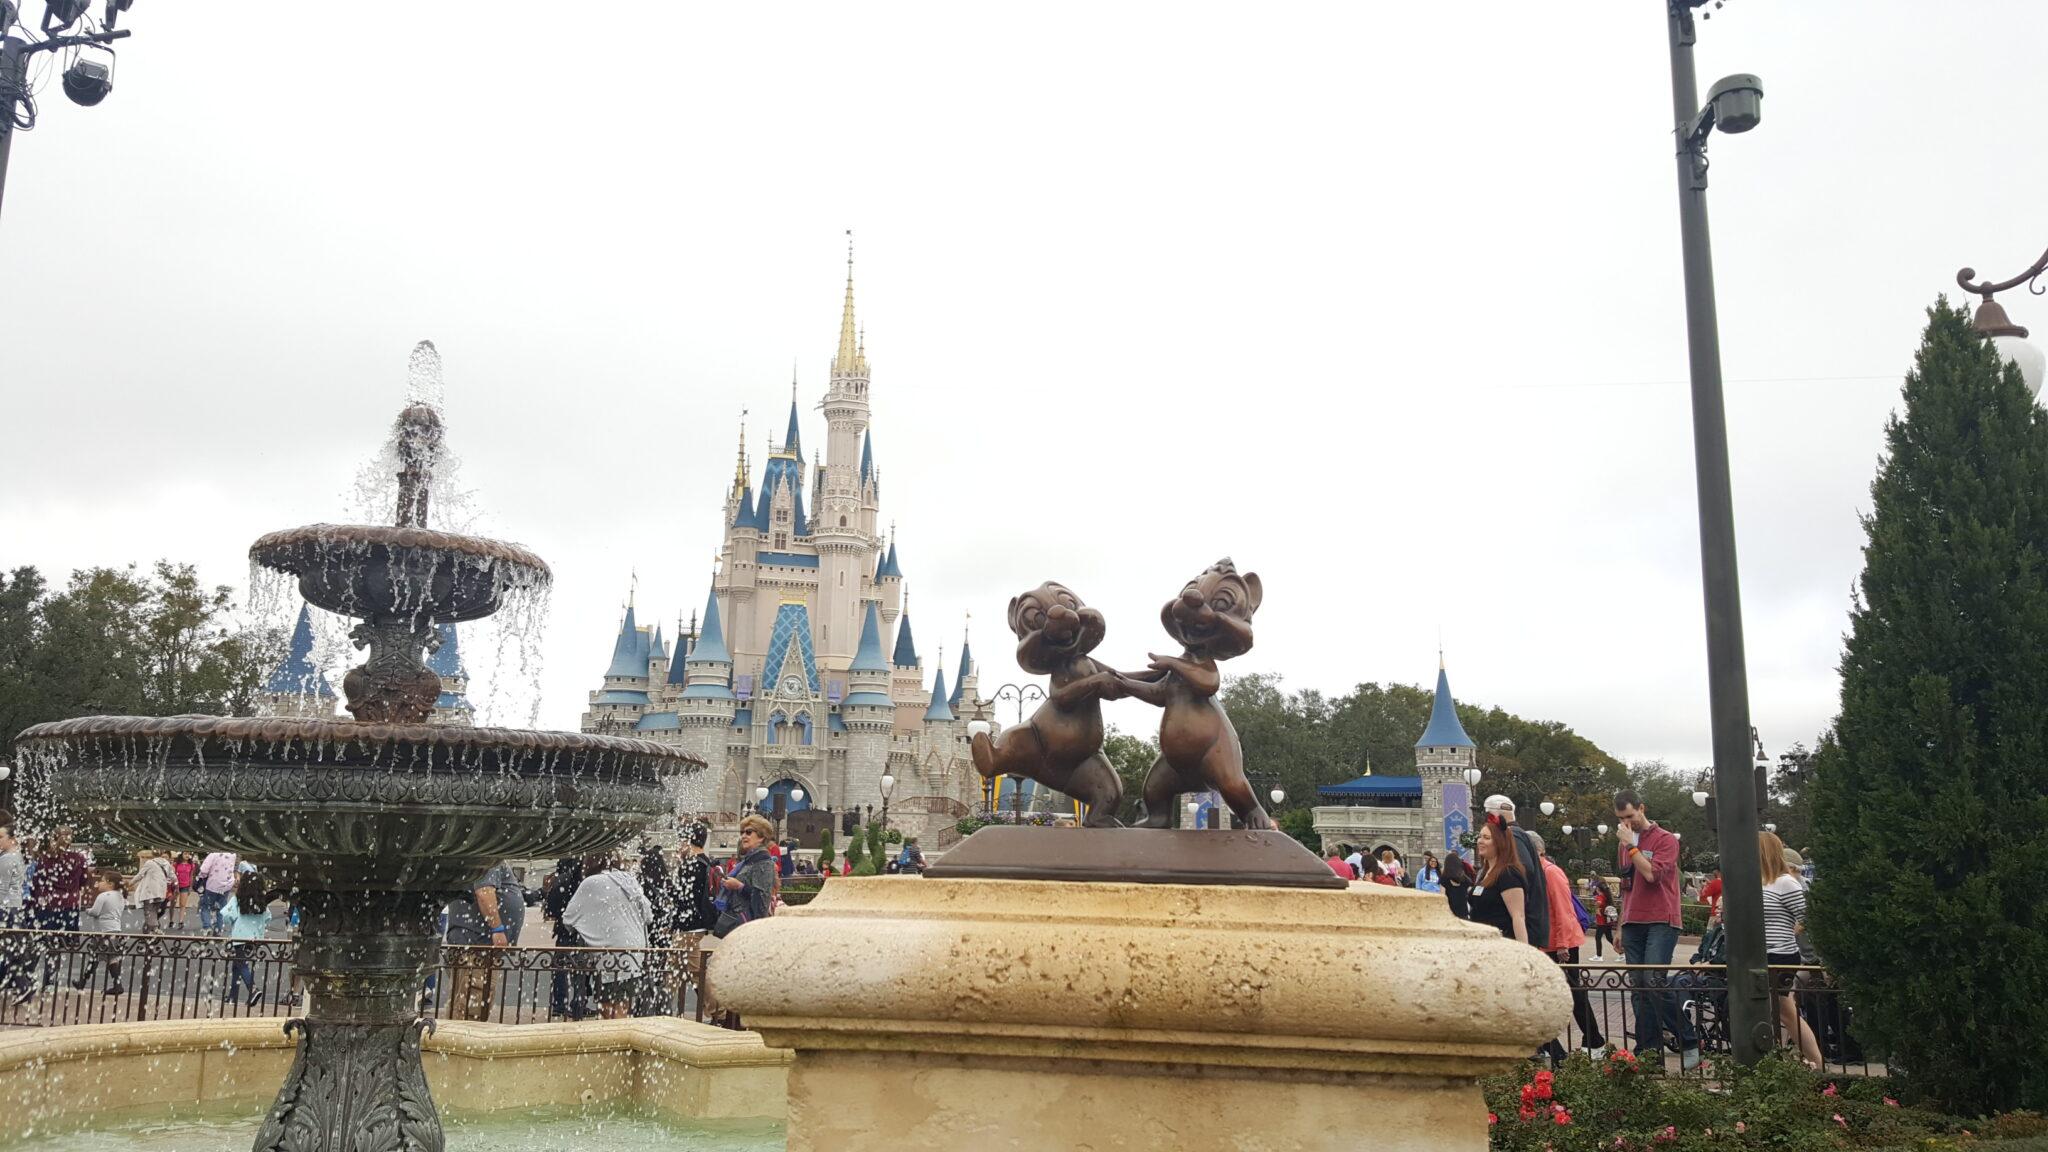 Disney World hurricane packing tips